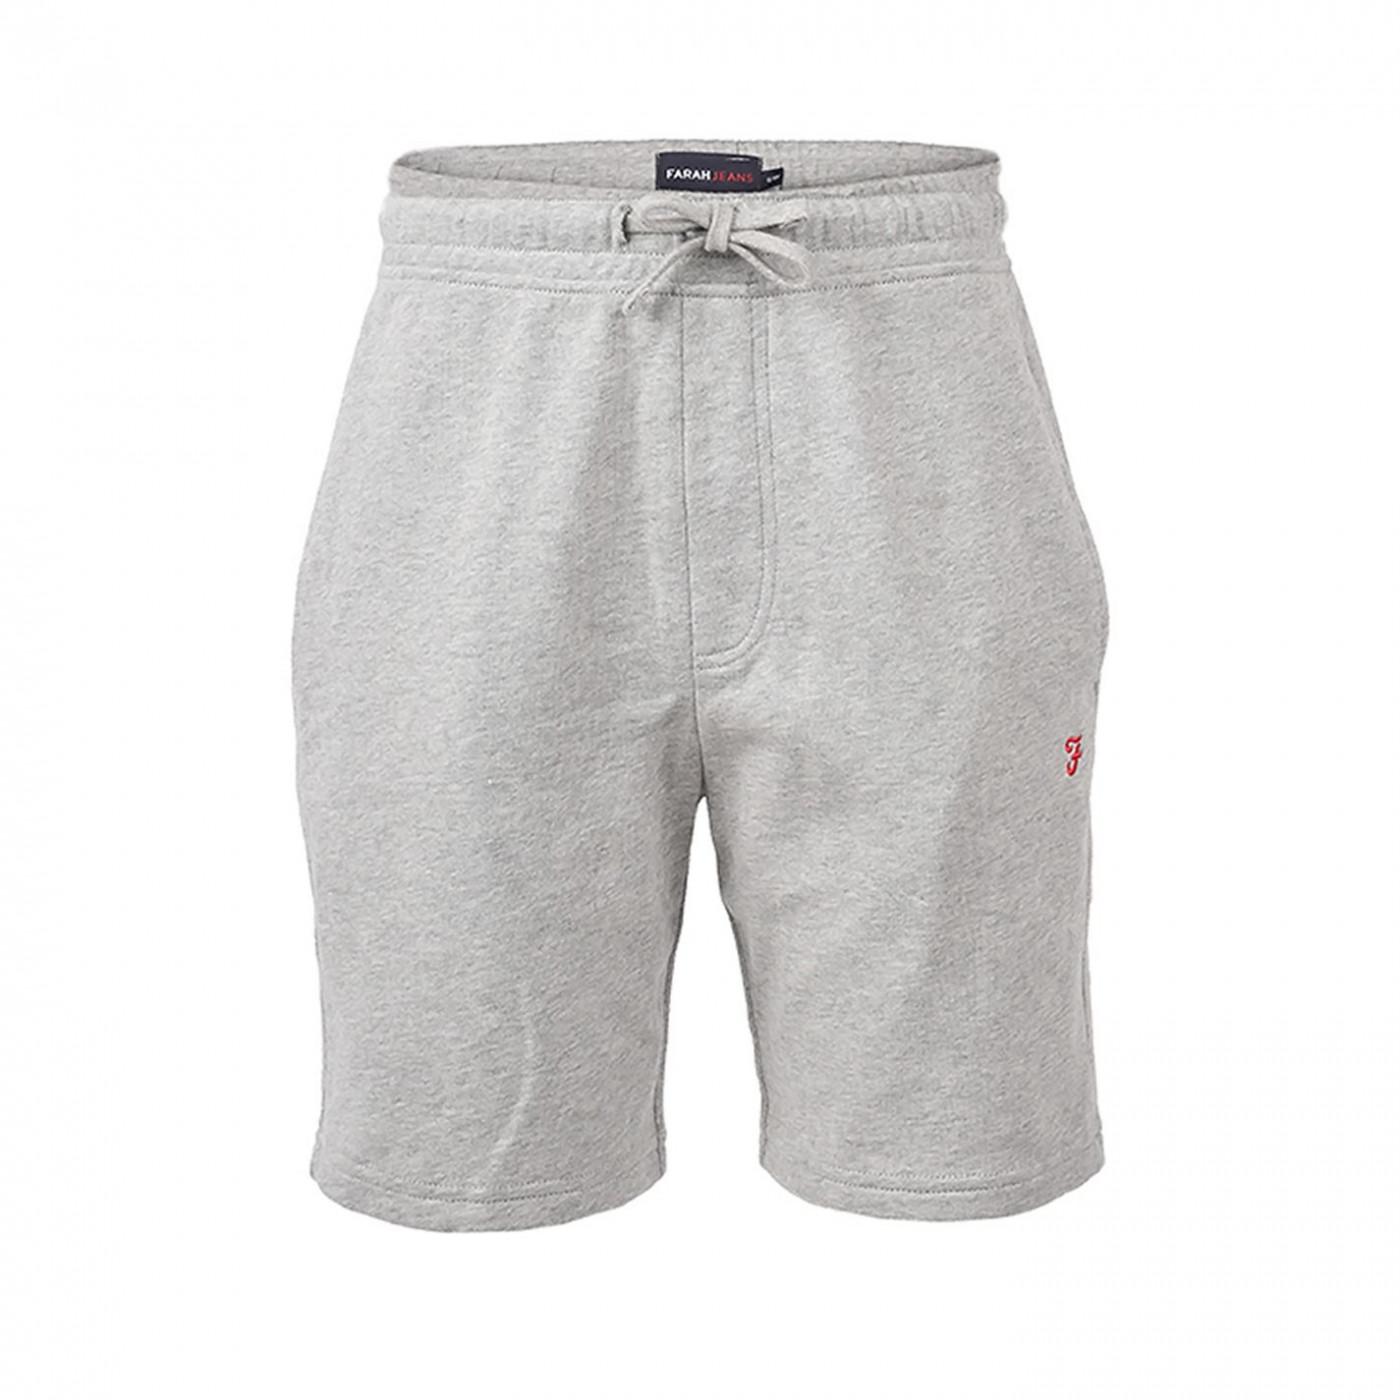 Farah Vintage Sweat Shorts